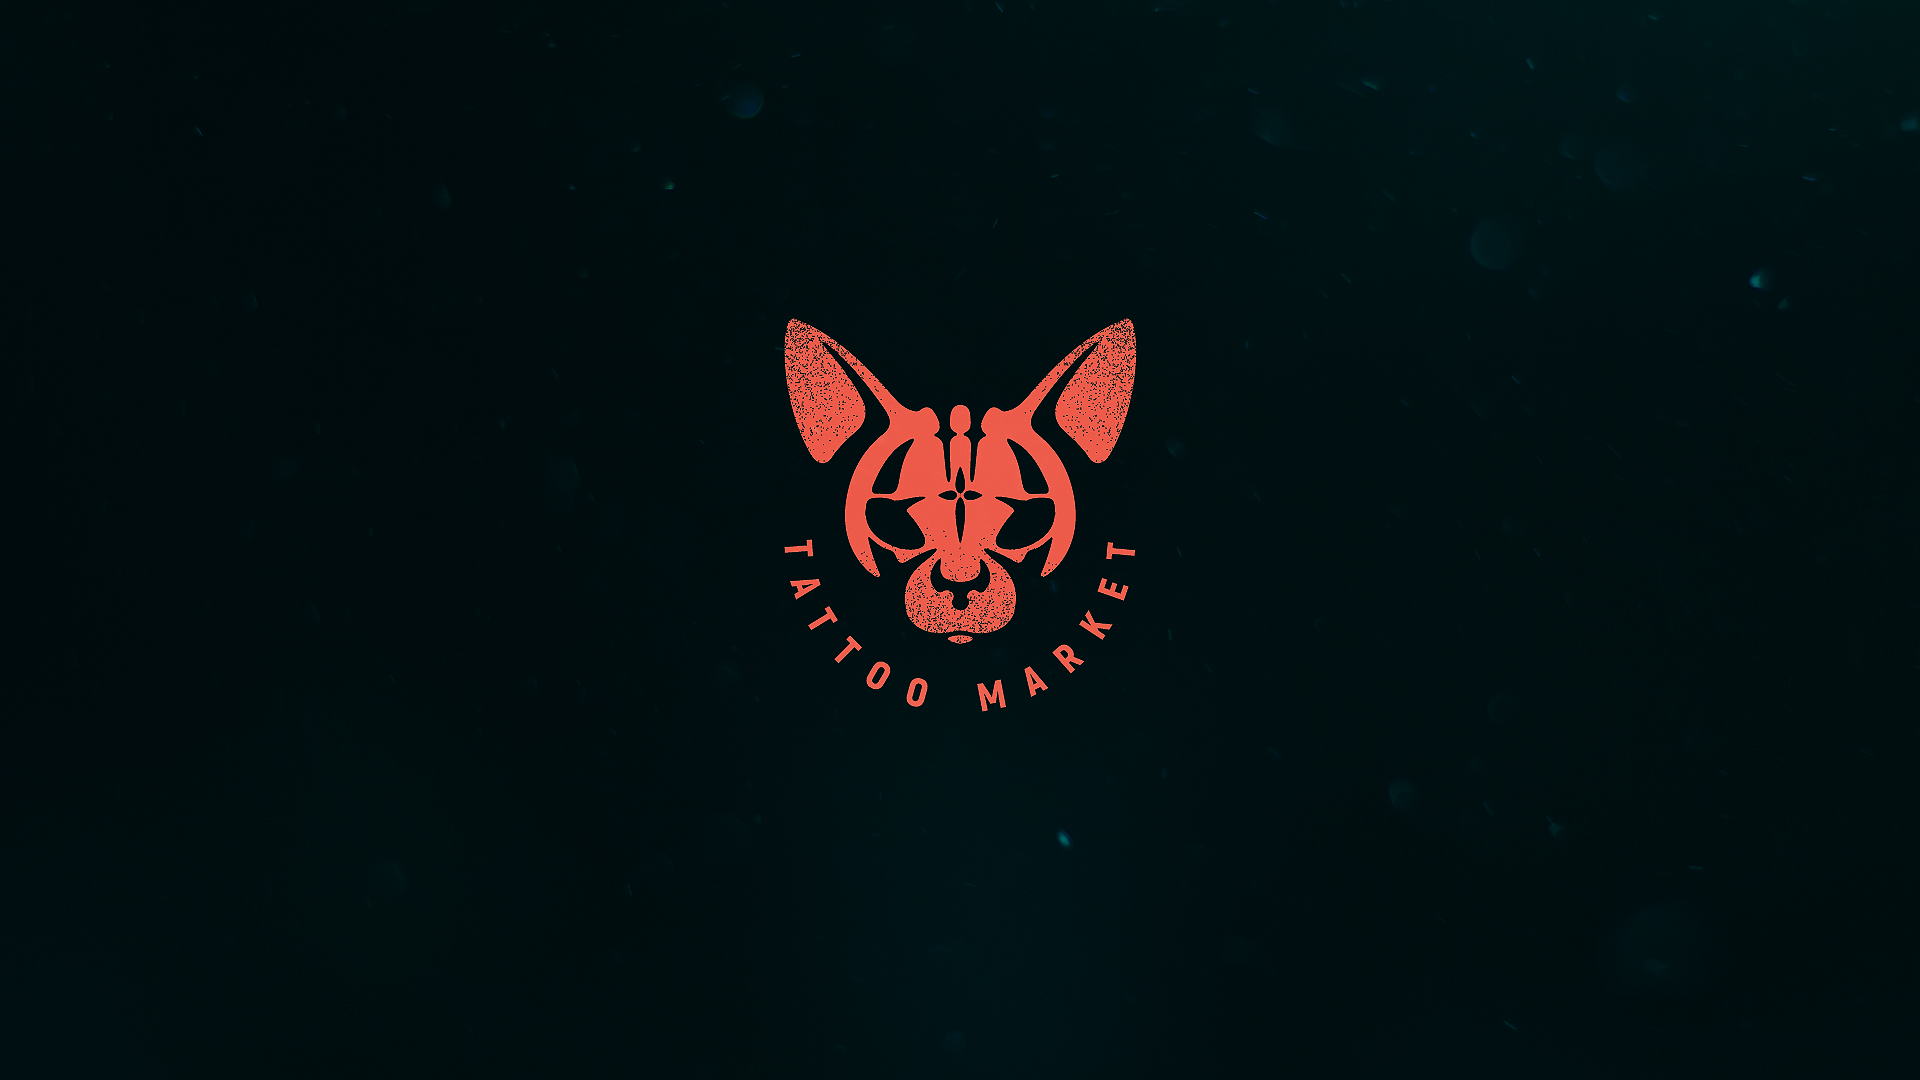 Редизайн логотипа магазина тату оборудования TattooMarket.ru фото f_8815c519606cafdf.jpg